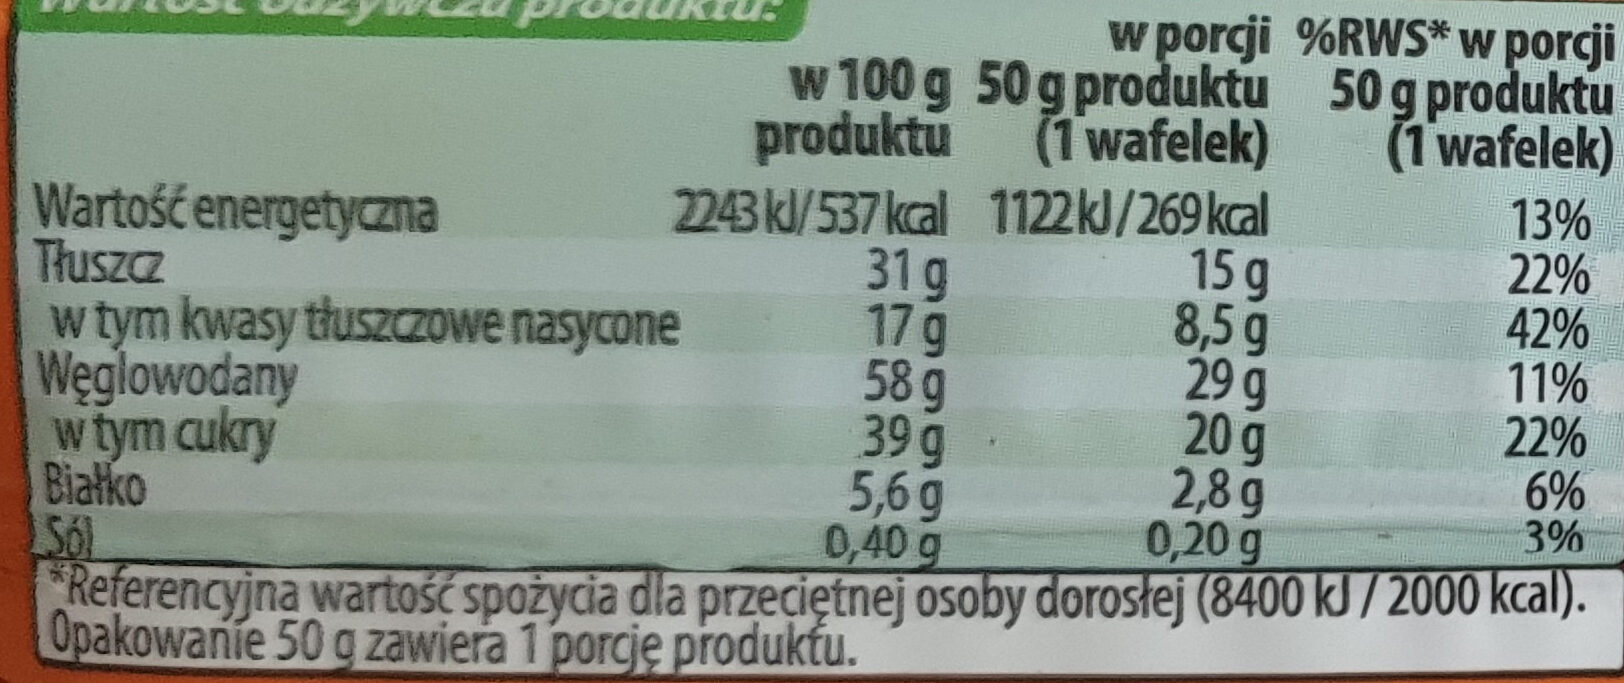 Estella o smaku toffi - Informations nutritionnelles - pl